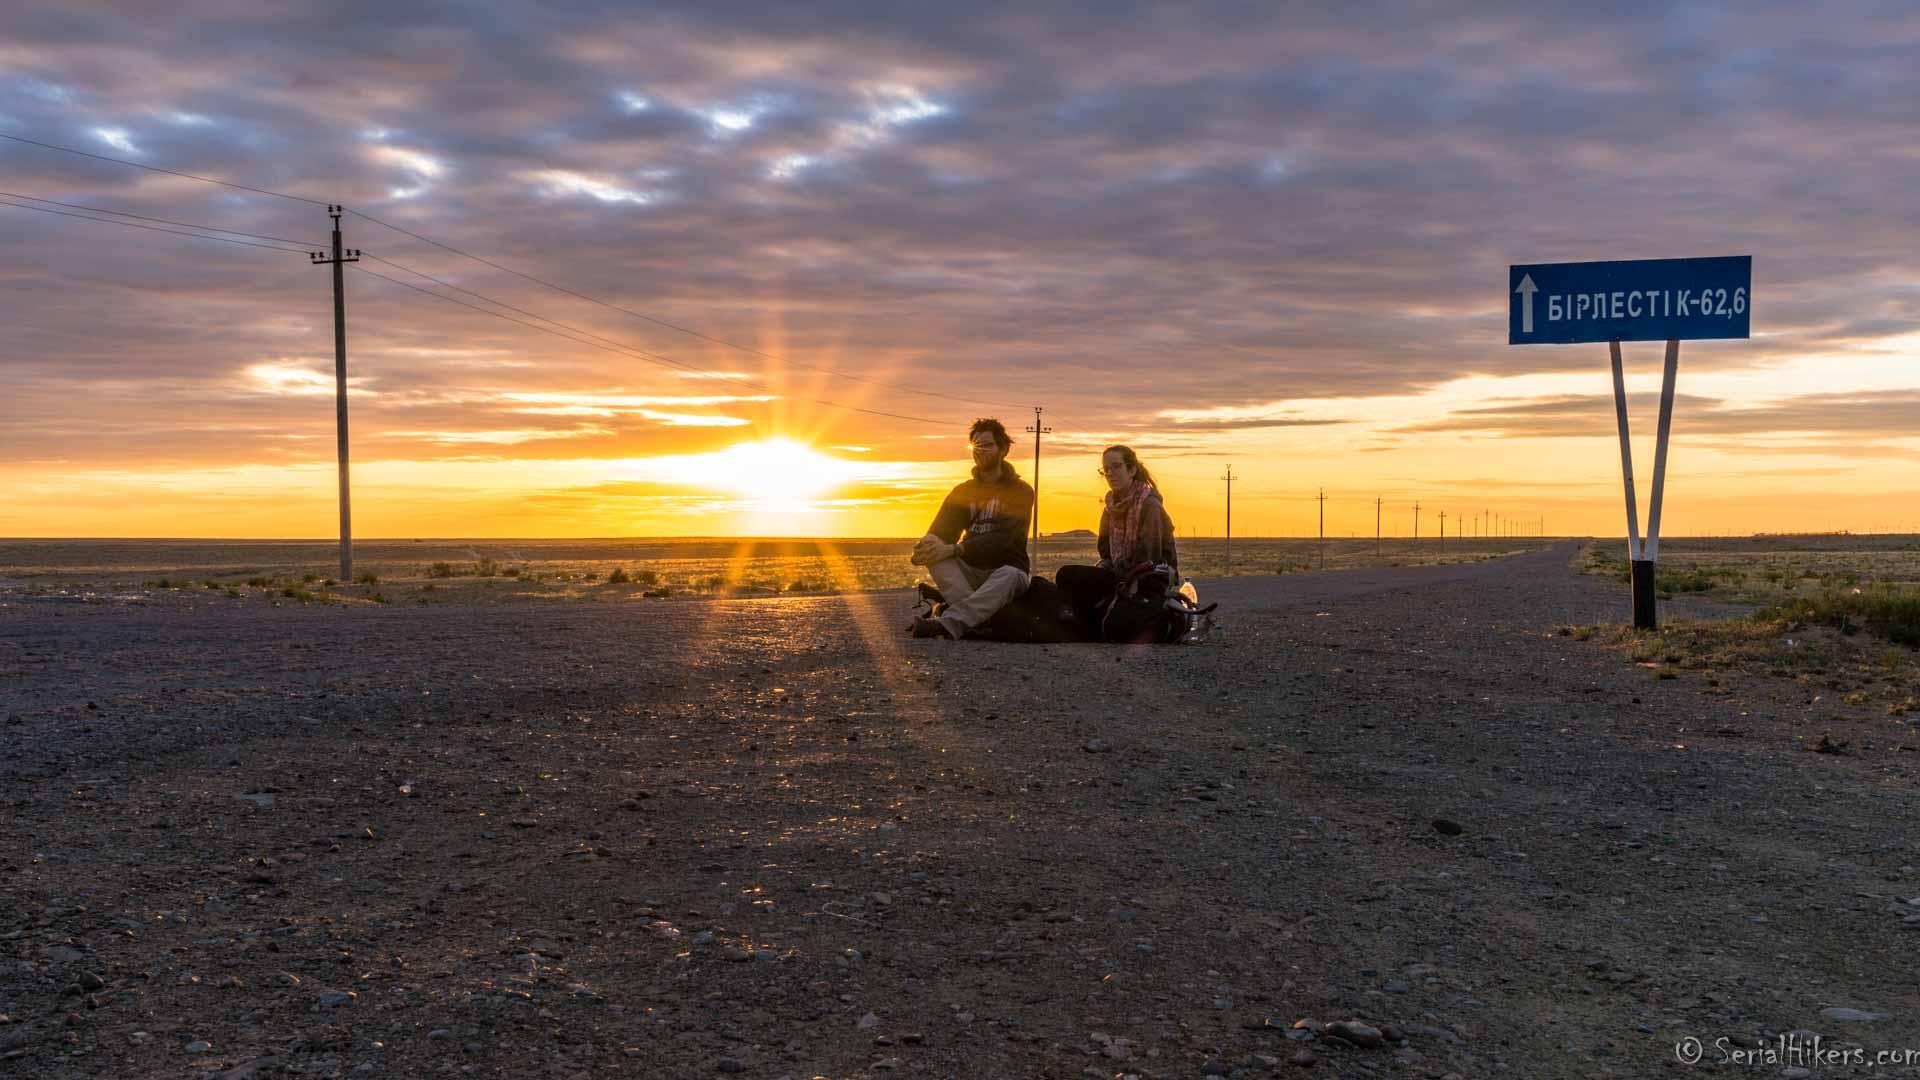 SerialHikers stop autostop world monde tour hitchhiking aventure adventure alternative travel voyage sans avion no fly Kazakhstan Aralsk